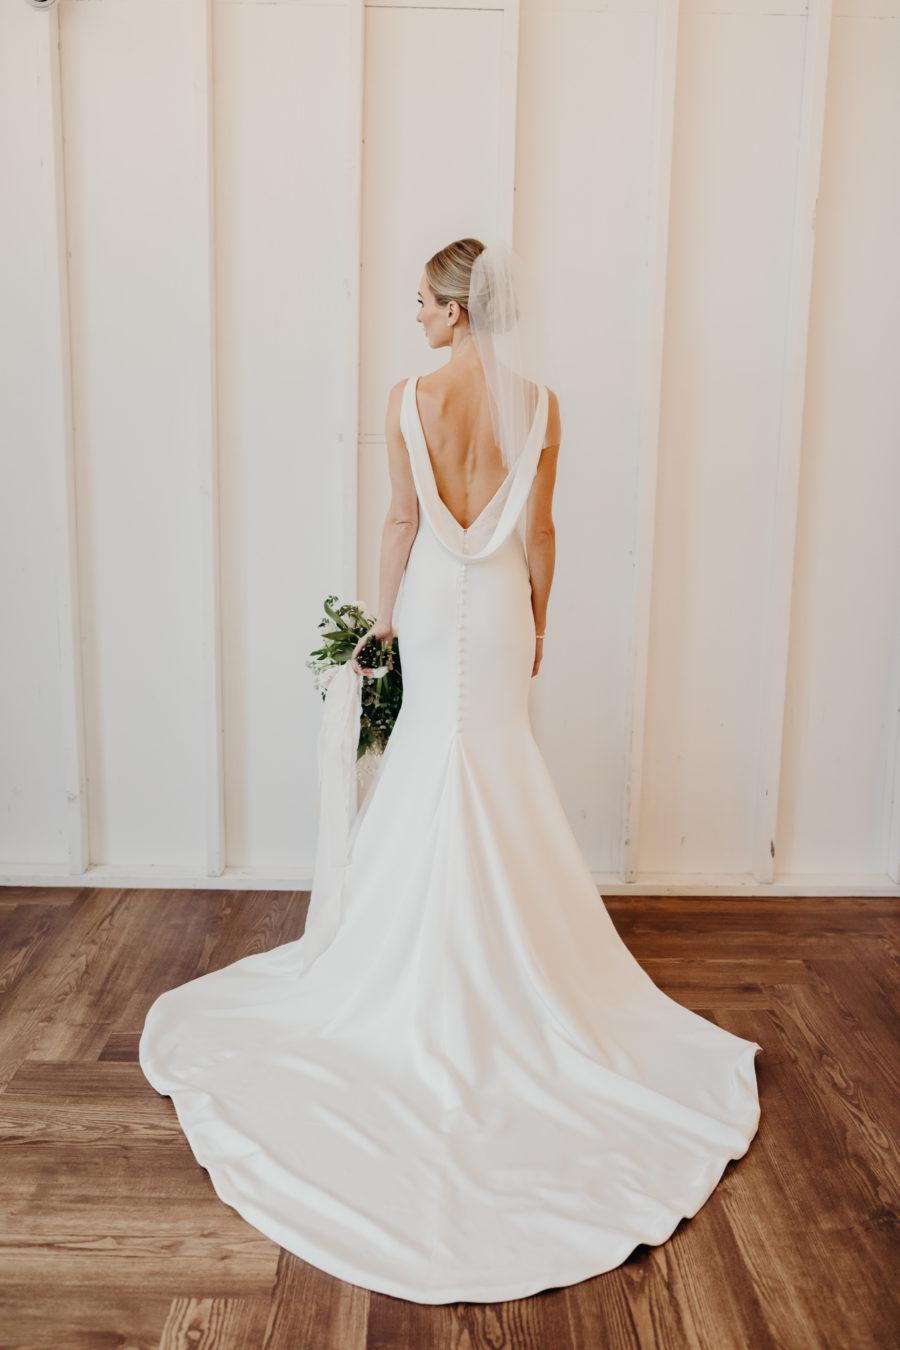 Olia Zavozina Wedding Dress: Lauren & Chris Lane's 14 TENN wedding featured on Nashville Bride Guide